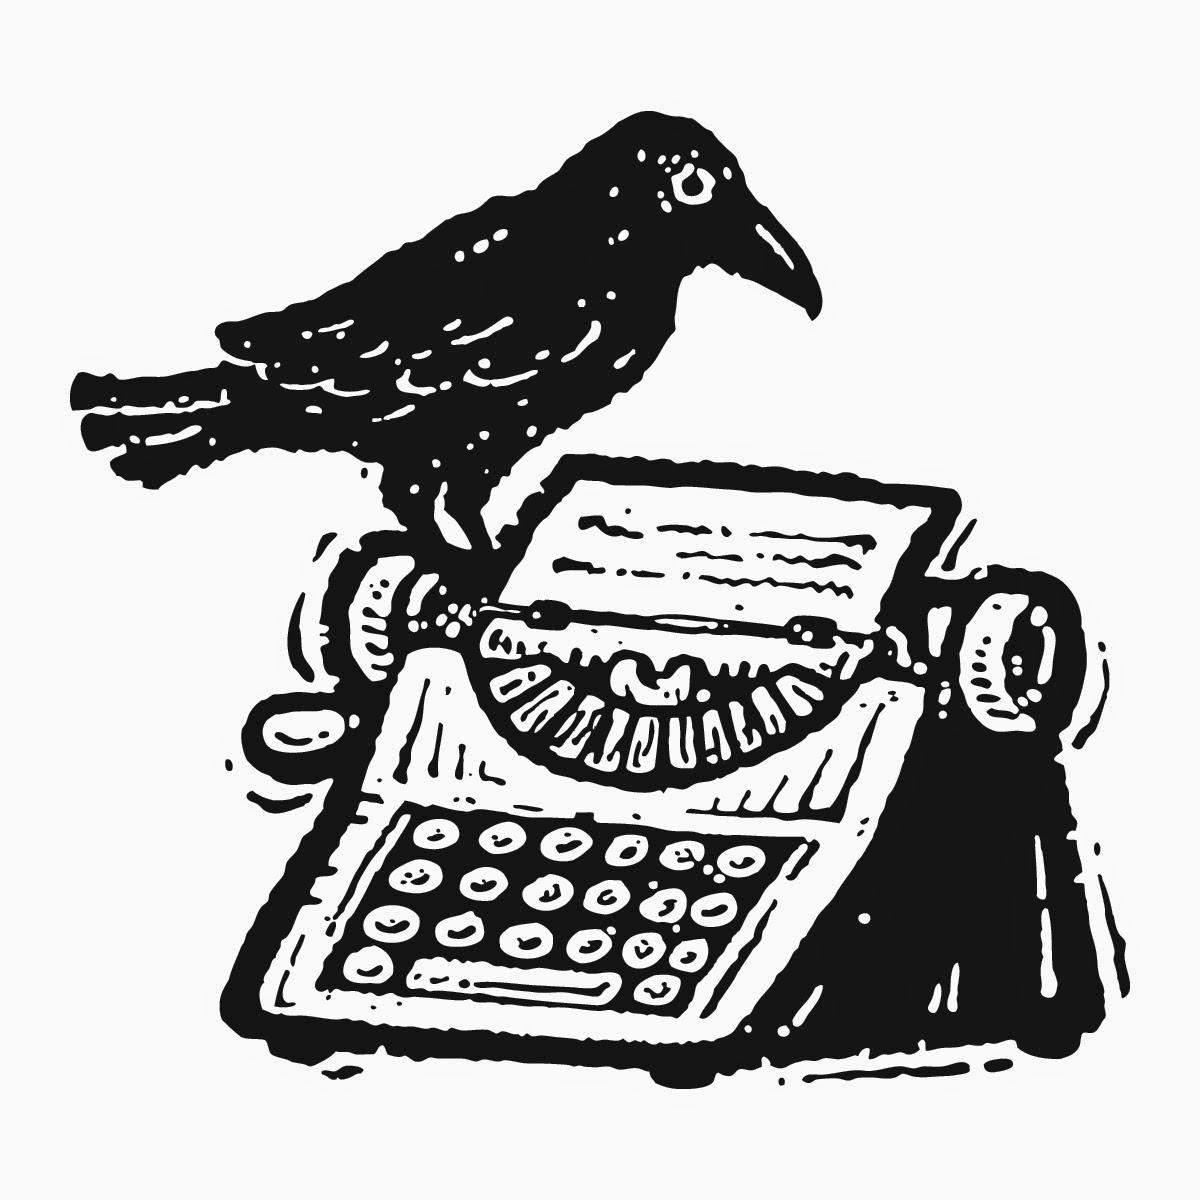 49 Writers